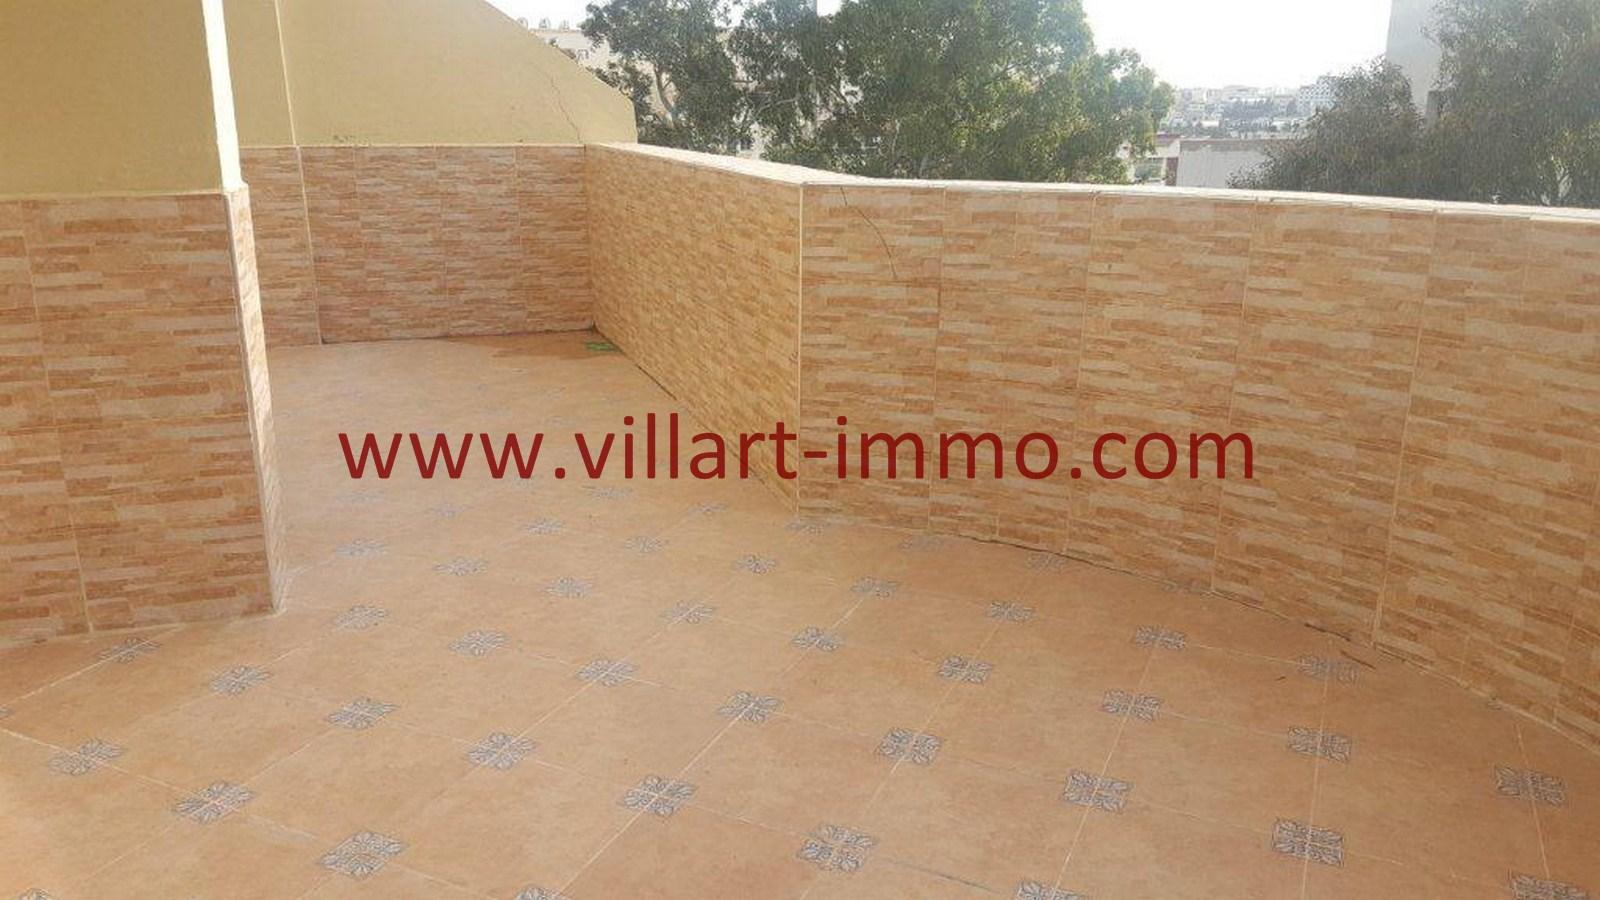 7-Vente-Appartement-Tanger-Val fleuri -Terrasse -VA484-Villart Immo